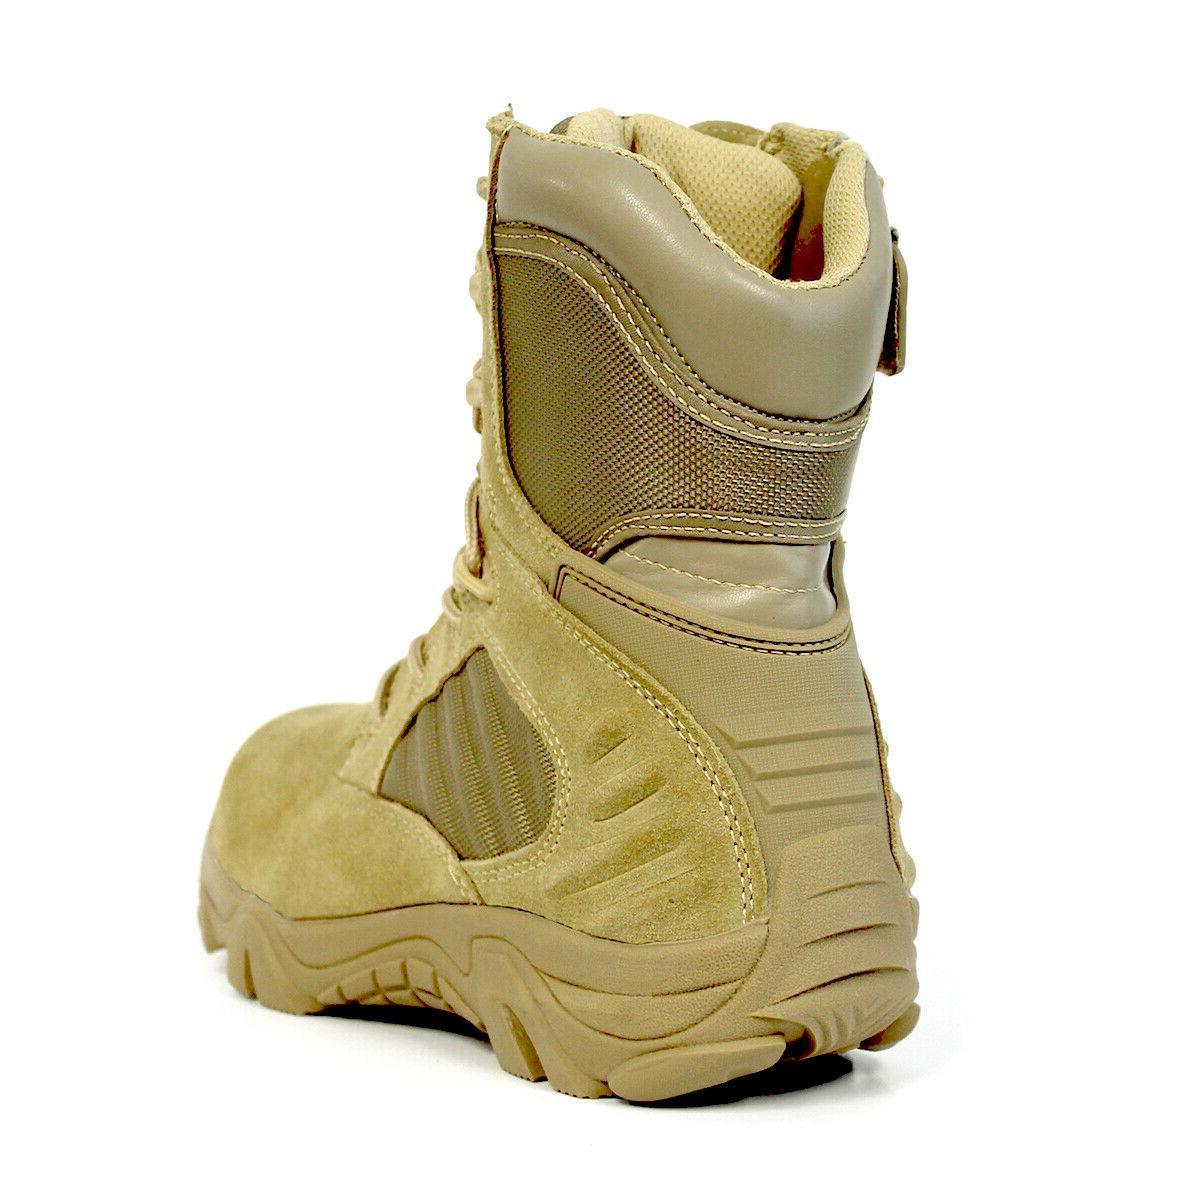 Bufferzone® Tan Military Combat Boots